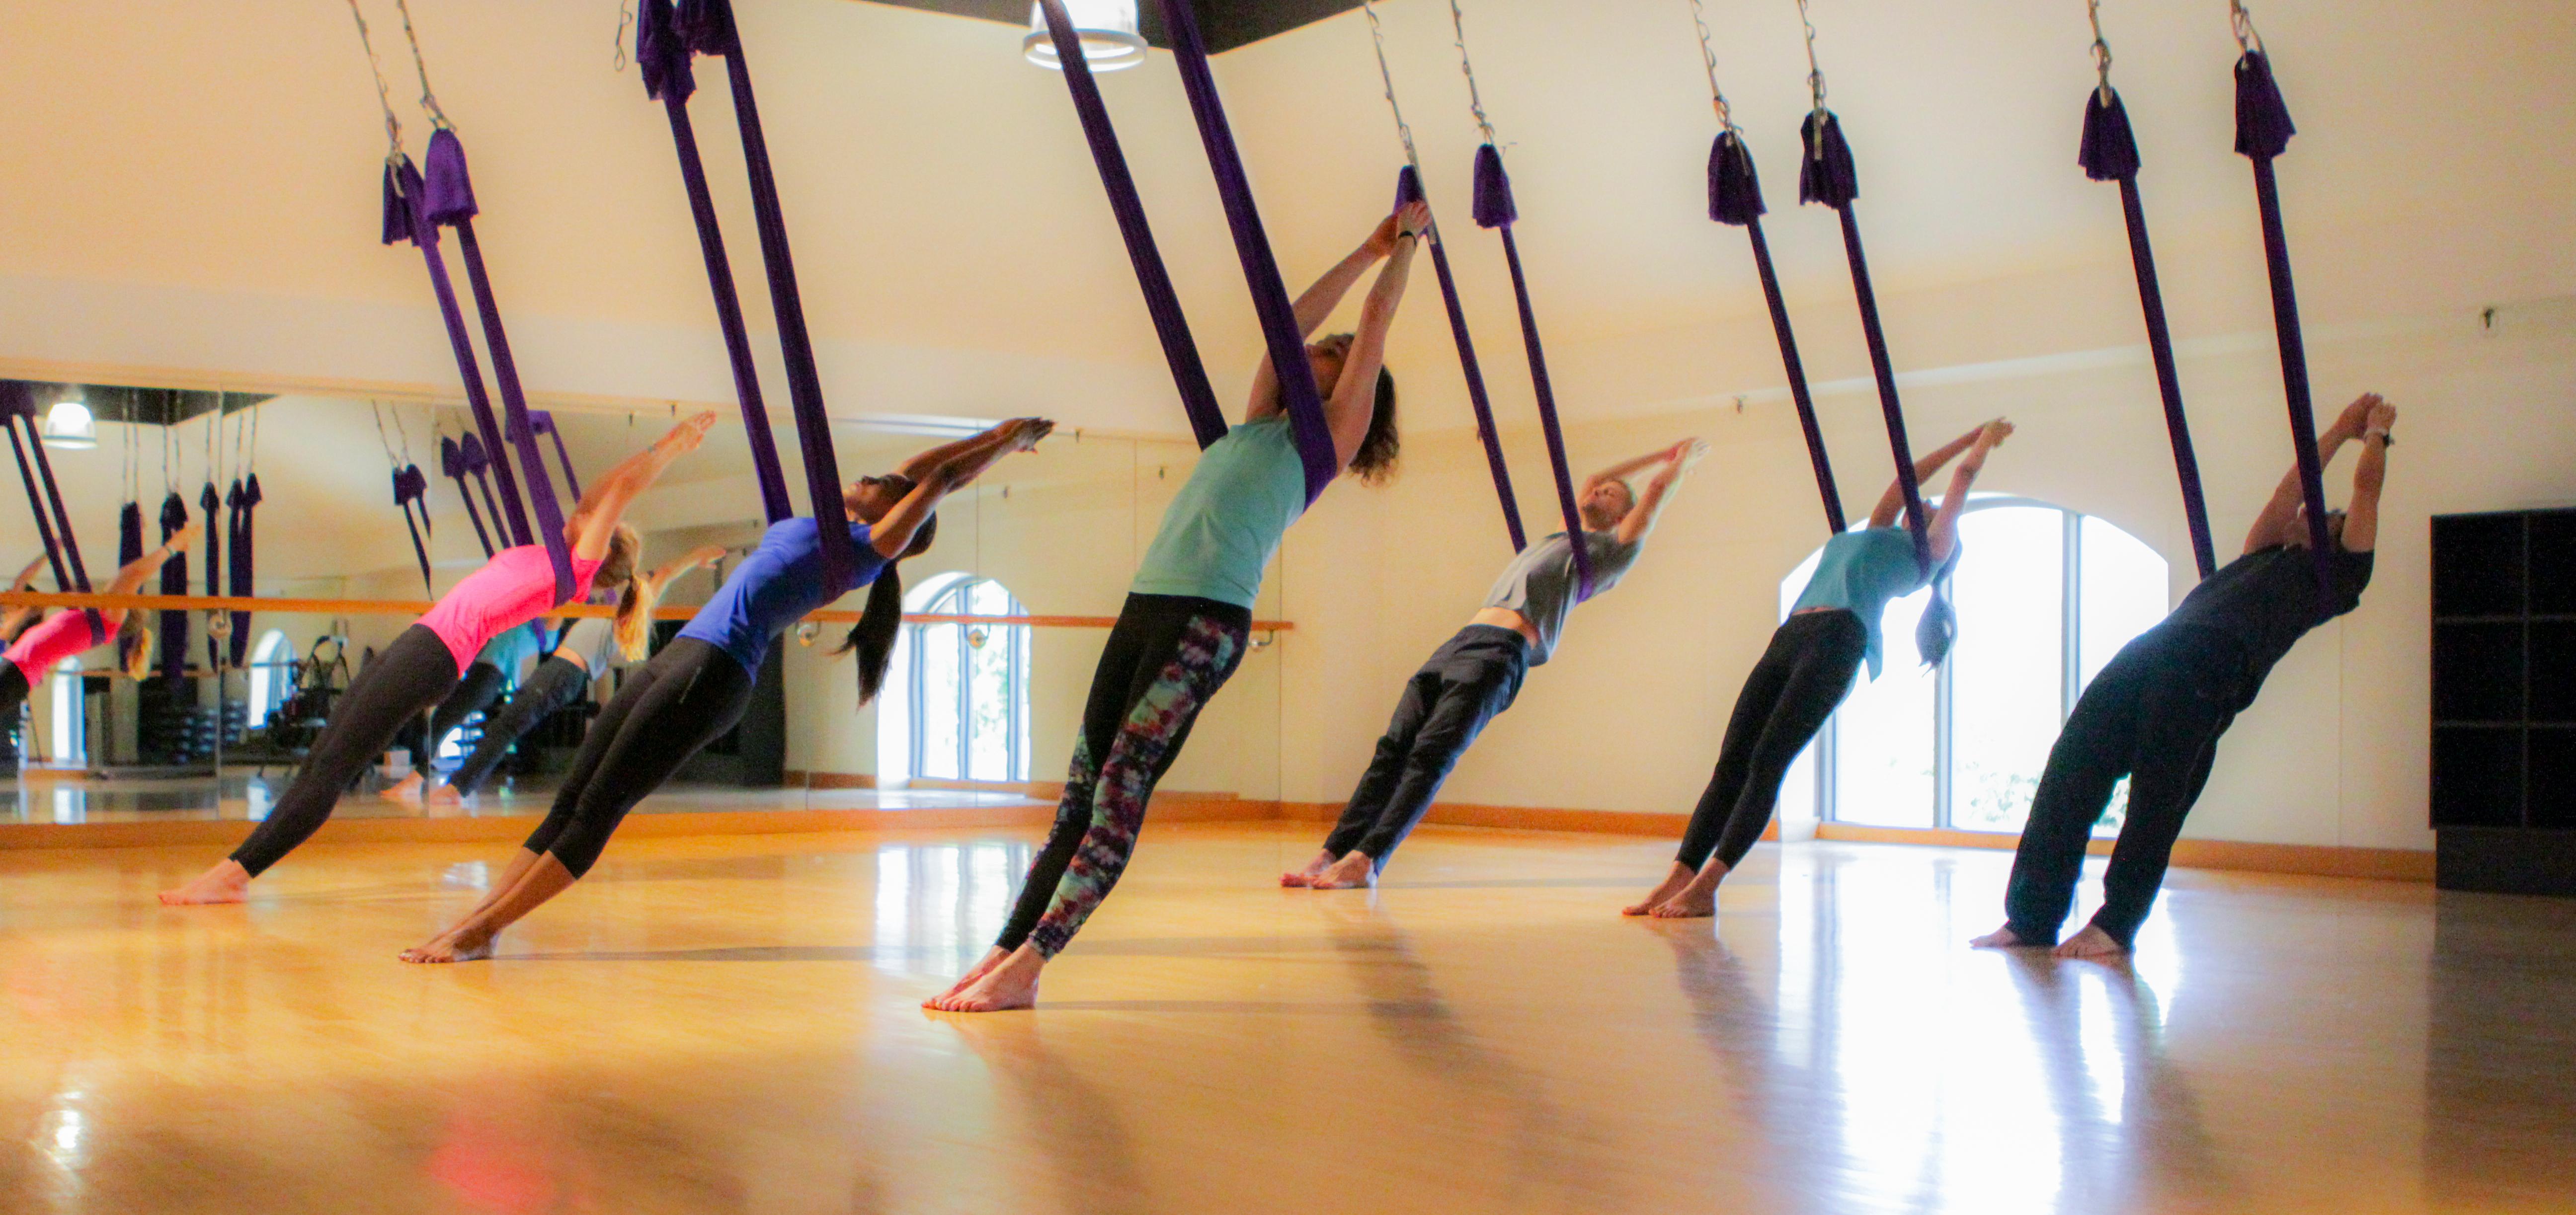 Class Review: AntiGravity Aerial Yoga - D Magazine